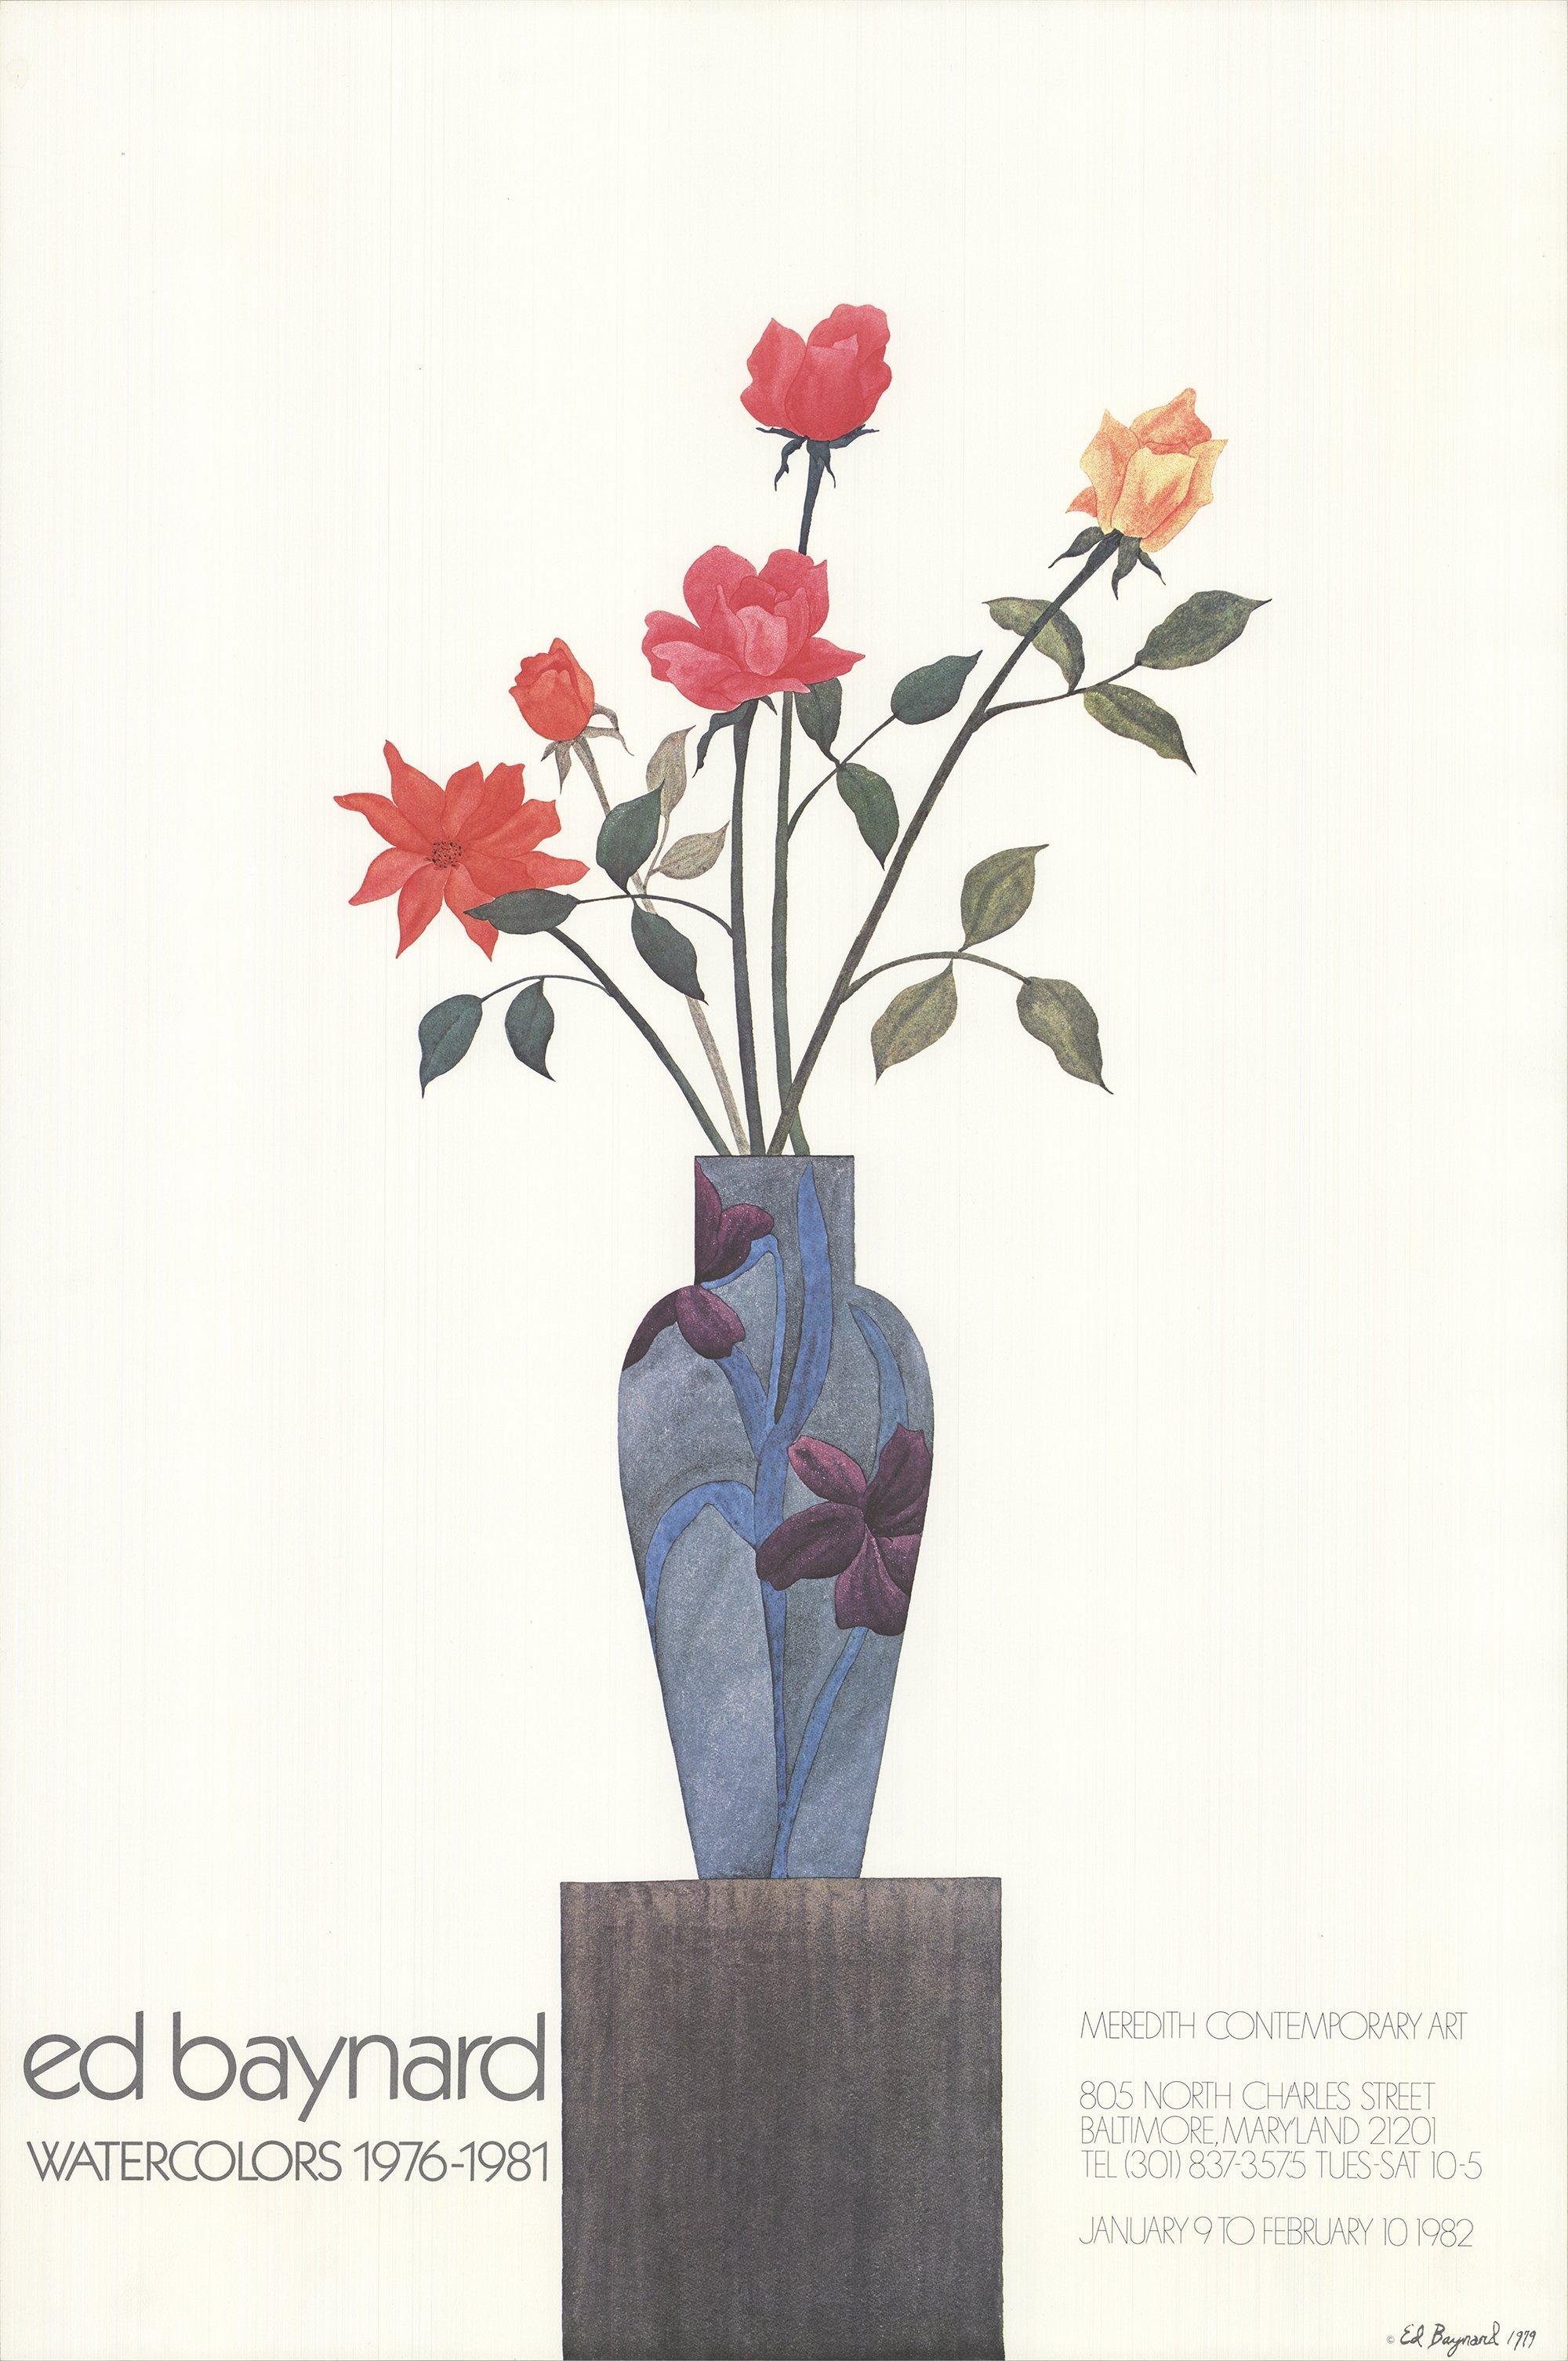 1982 After Ed Baynard 'Watercolors' USA Offset Lithograph